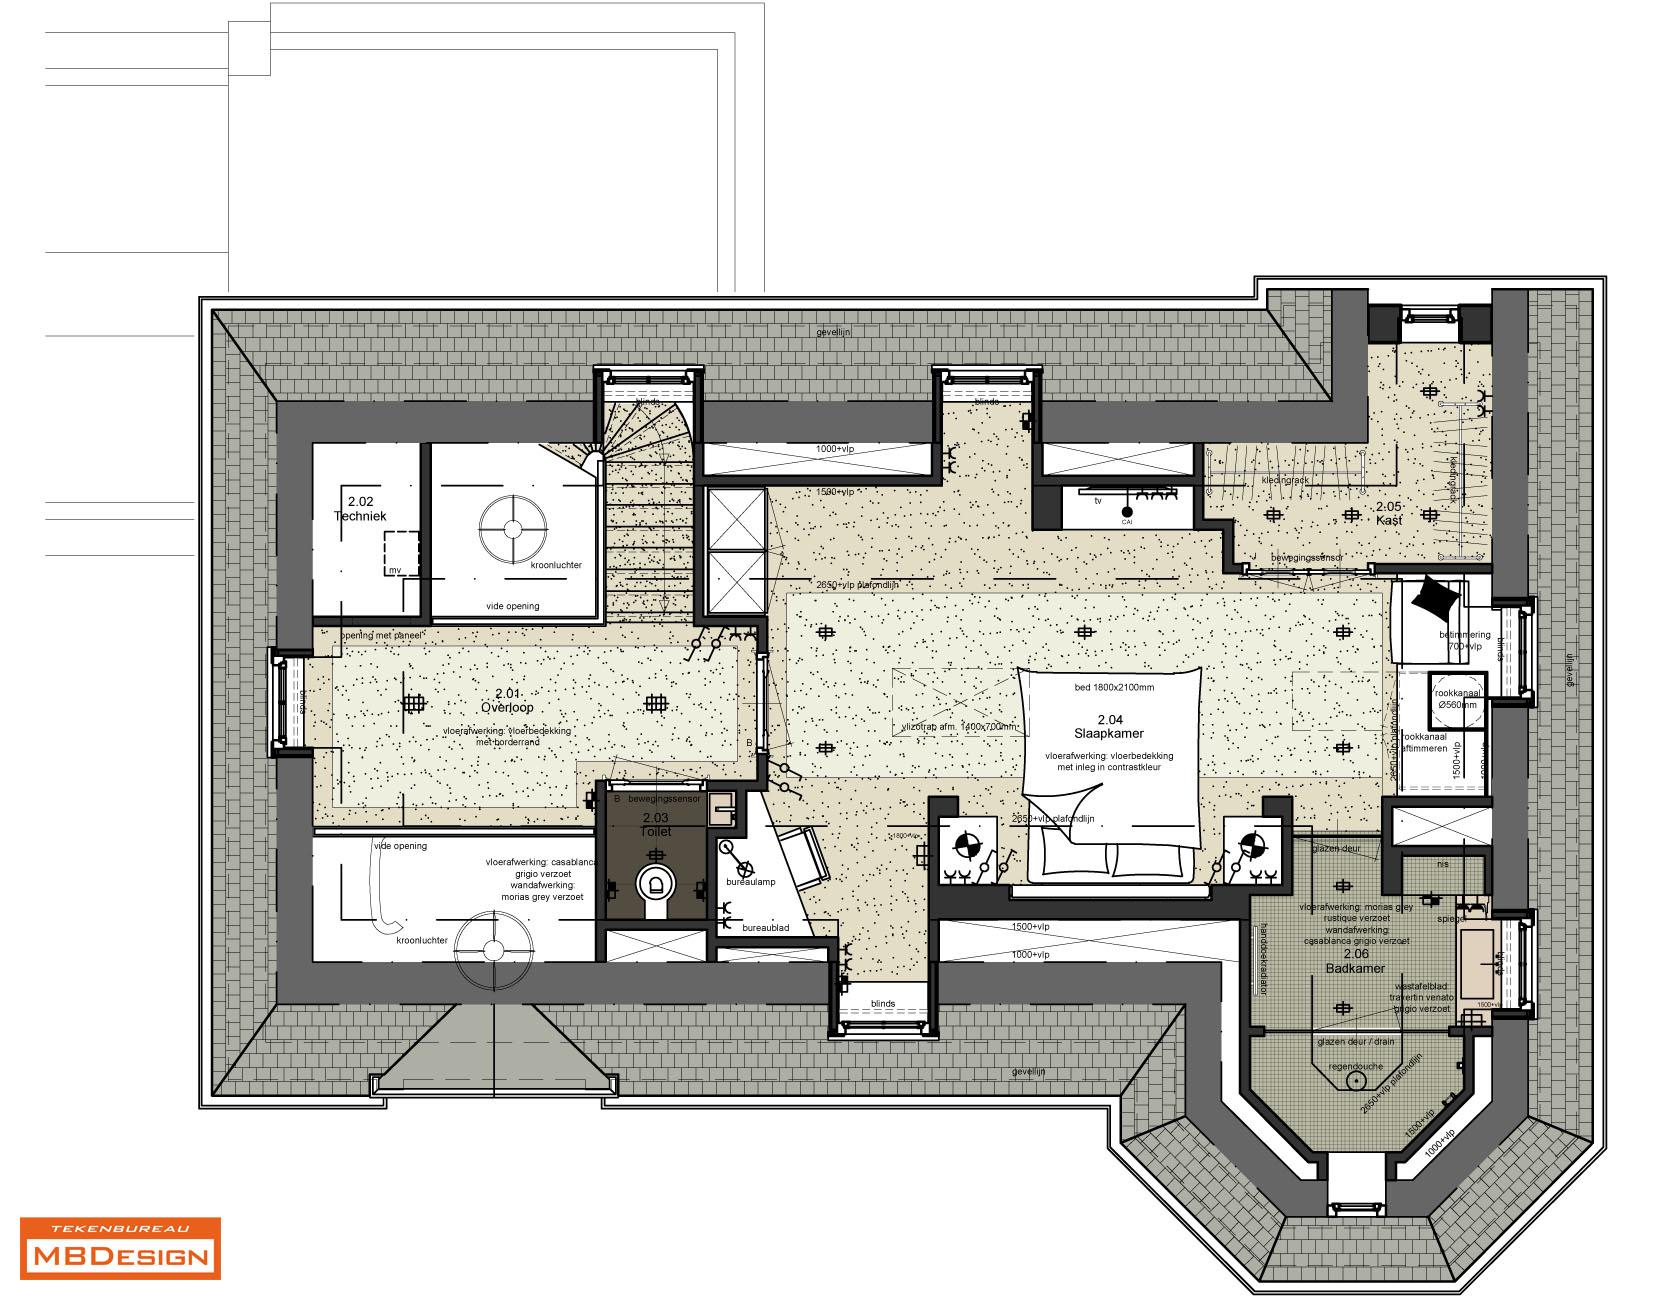 Interieurontwerp tekening interieur meubilair idee n for Interieur ontwerp